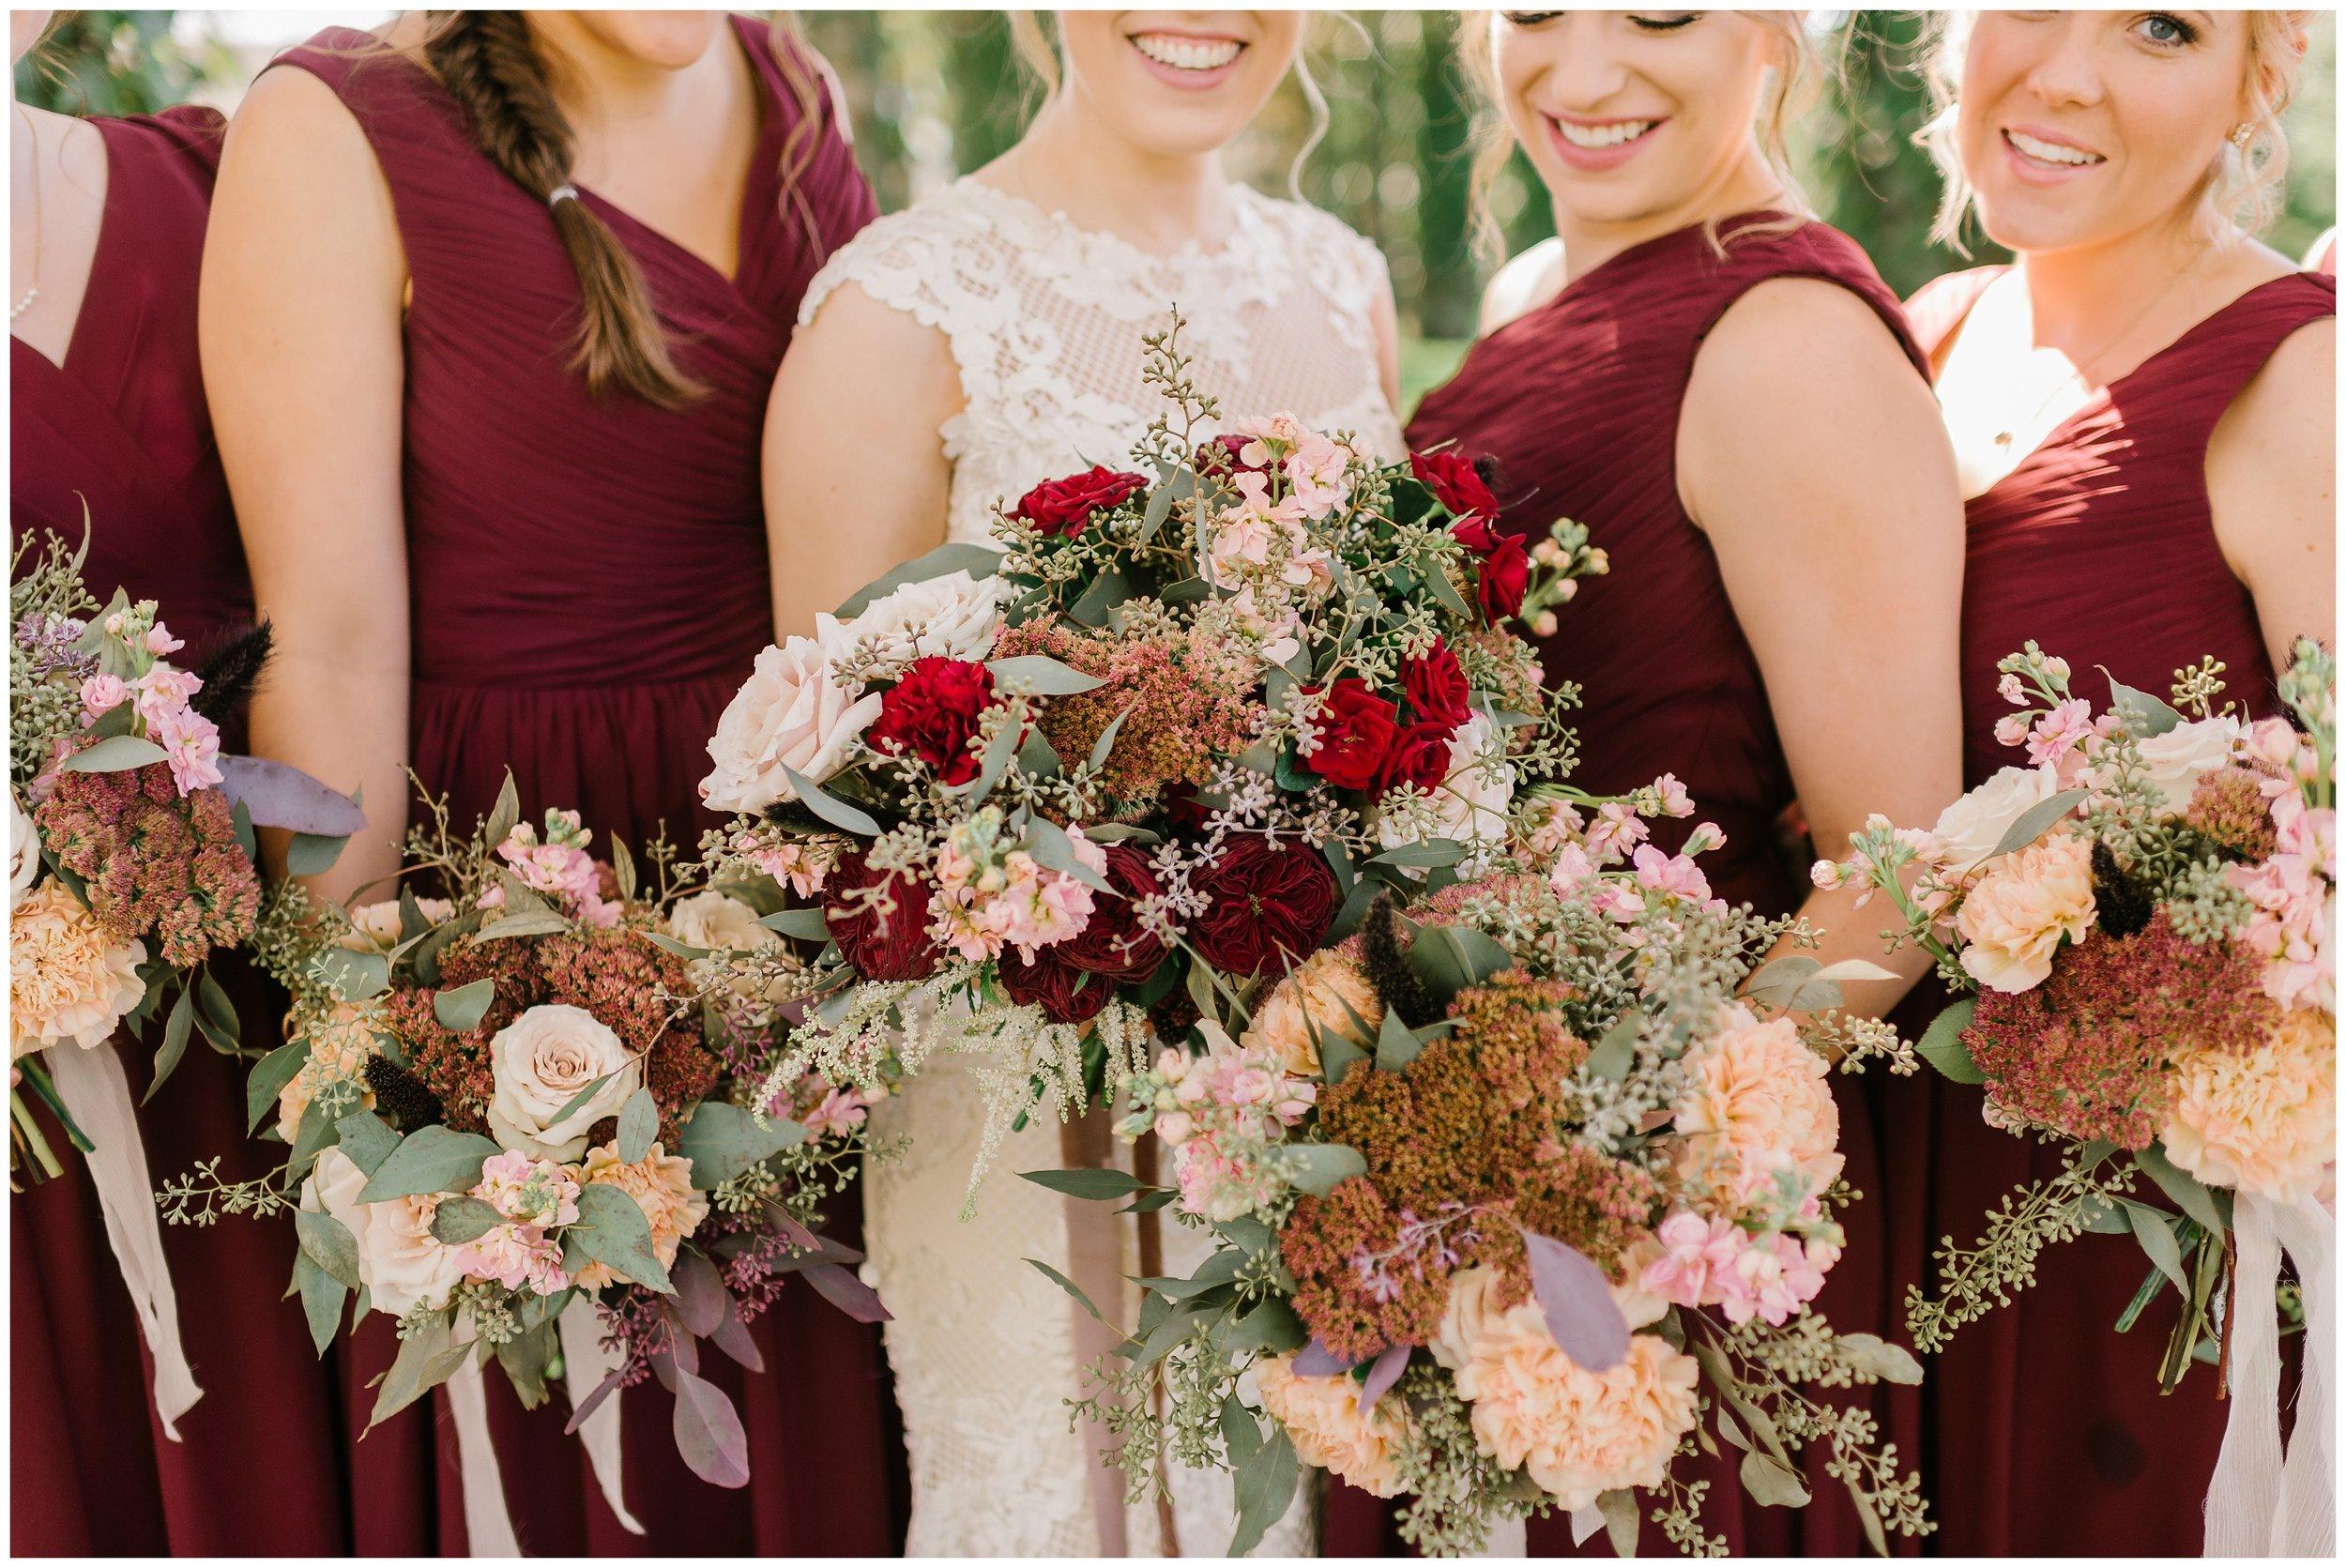 Rebecca_Shehorn_Photography_Indianapolis_Wedding_Photographer_7328.jpg